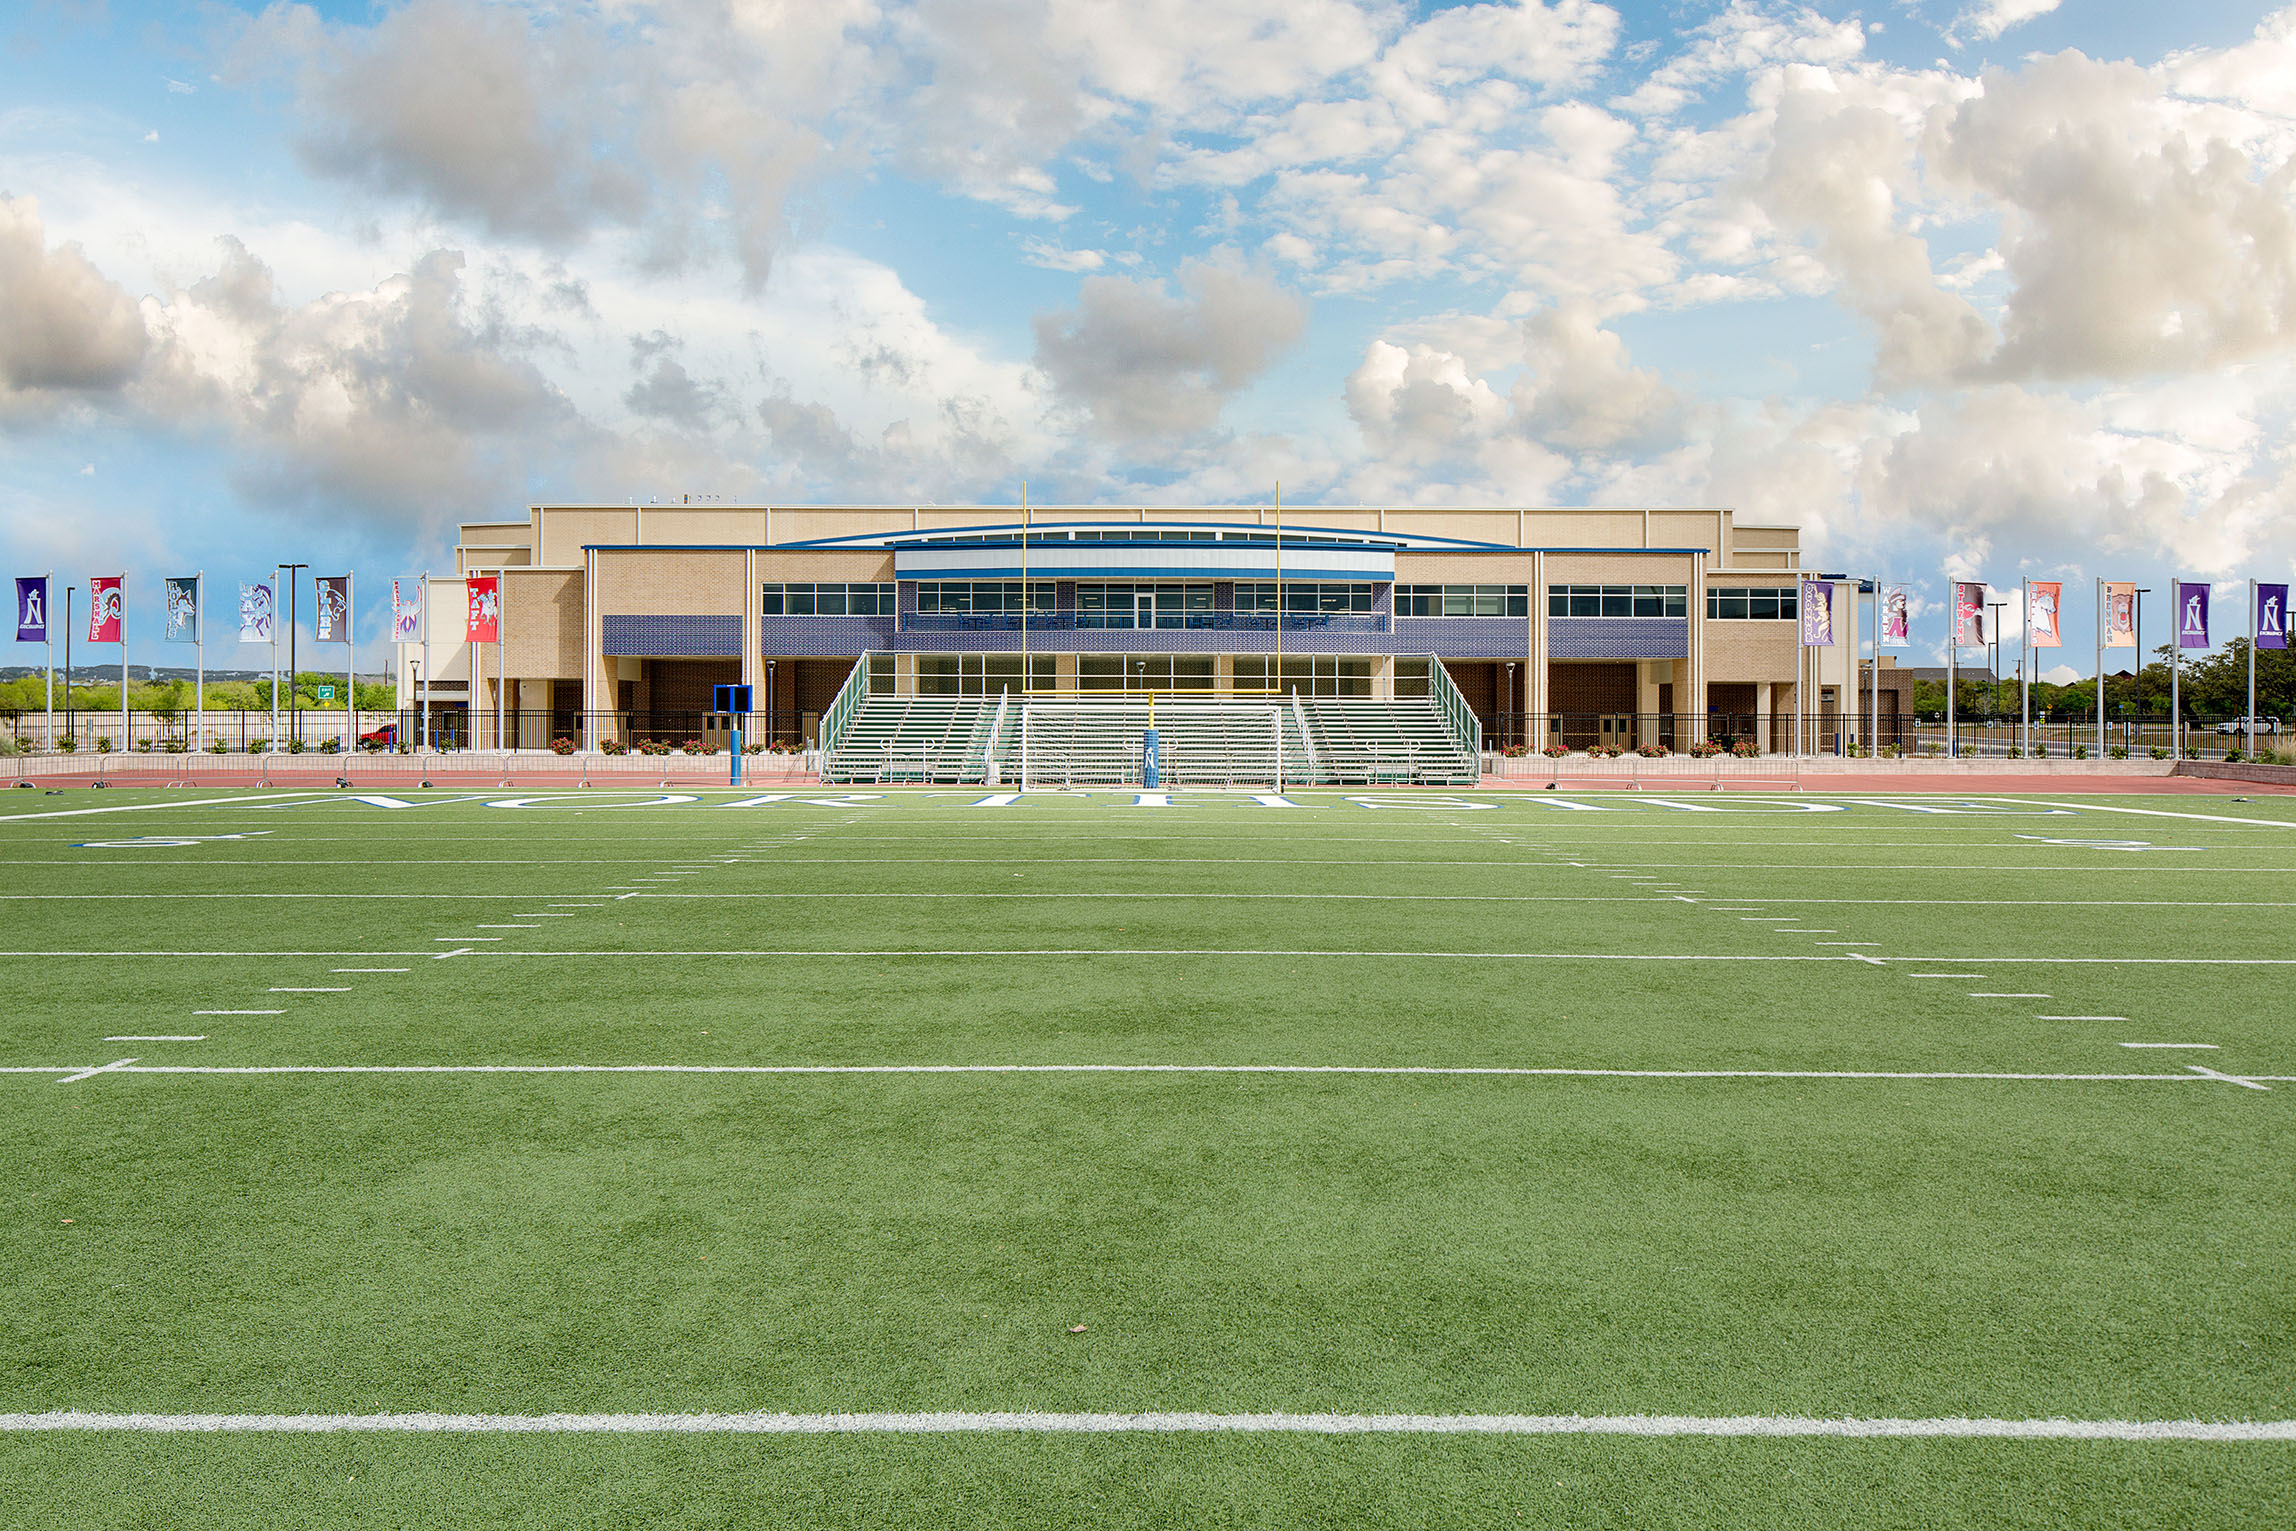 Northside Isd Competitive Sports Gymnasium Marmon Mok